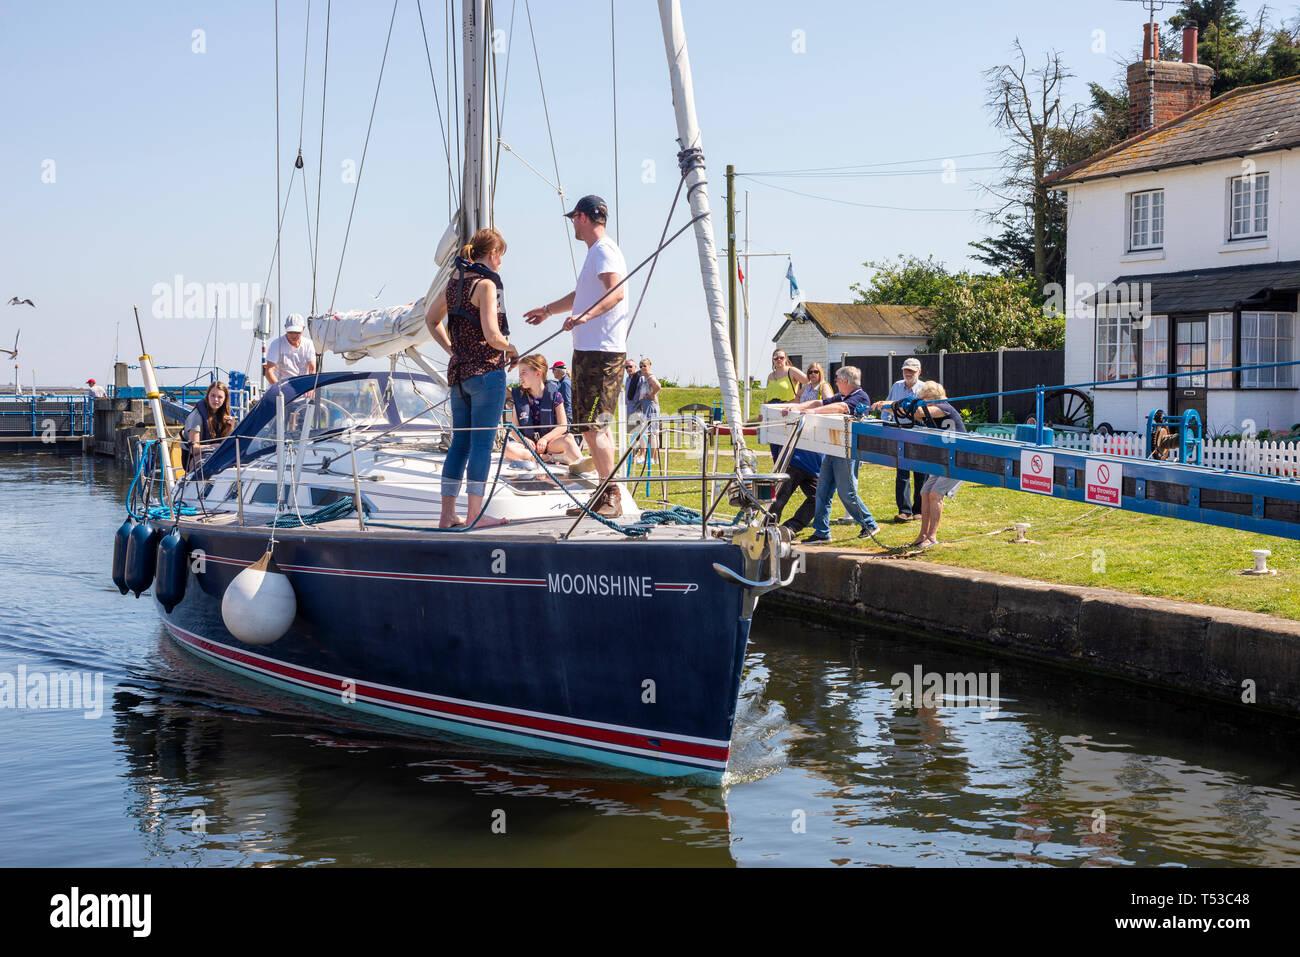 Yacht named Moonshine in Heybridge Basin lock, Essex, UK, entering the Chelmer and Blackwater navigation. People operating the lock gate. Sea lock - Stock Image